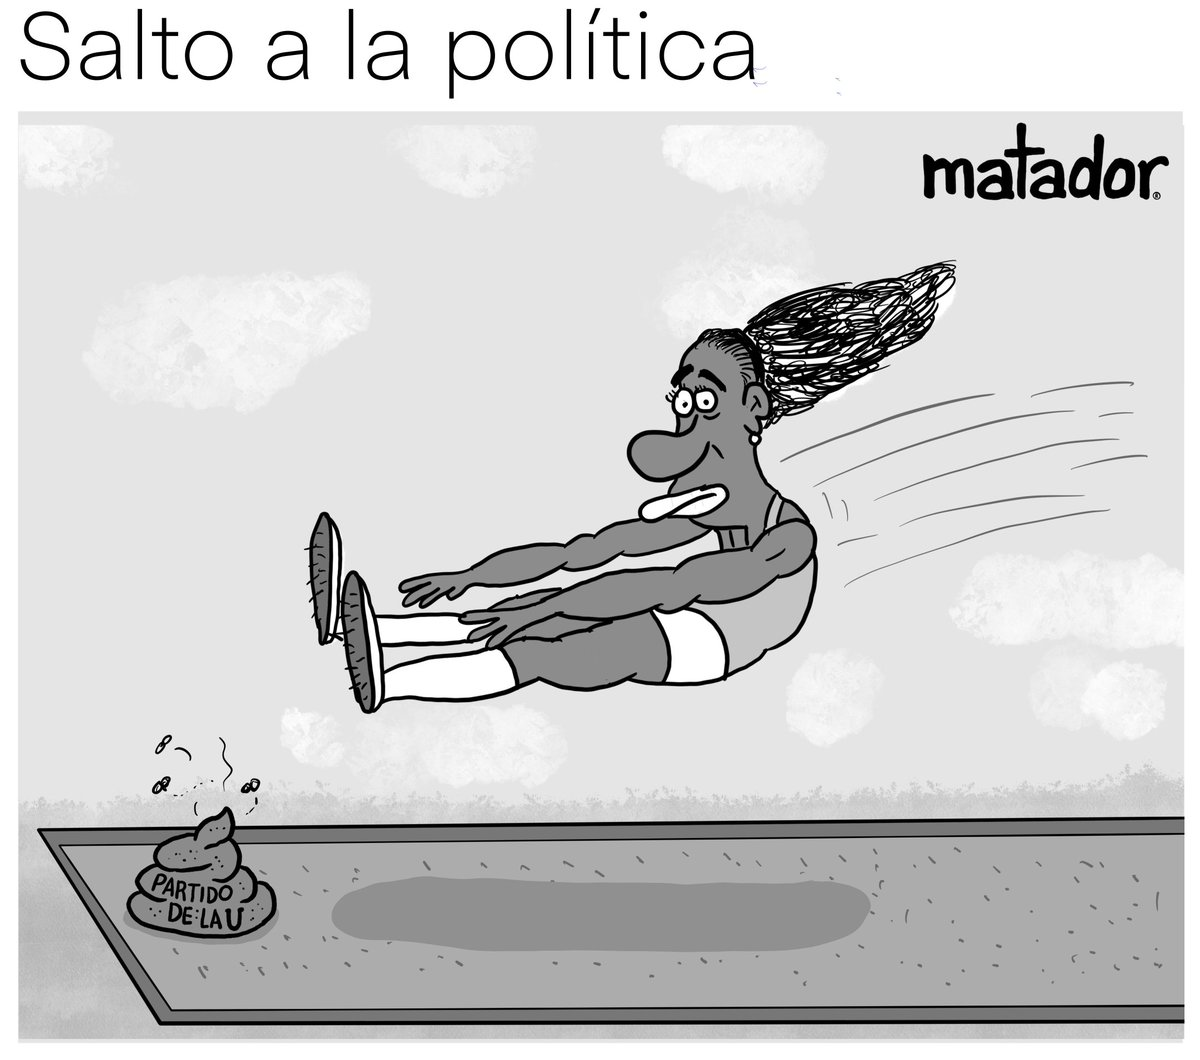 matador (@Matador000) on Twitter photo 2021-10-22 10:18:45